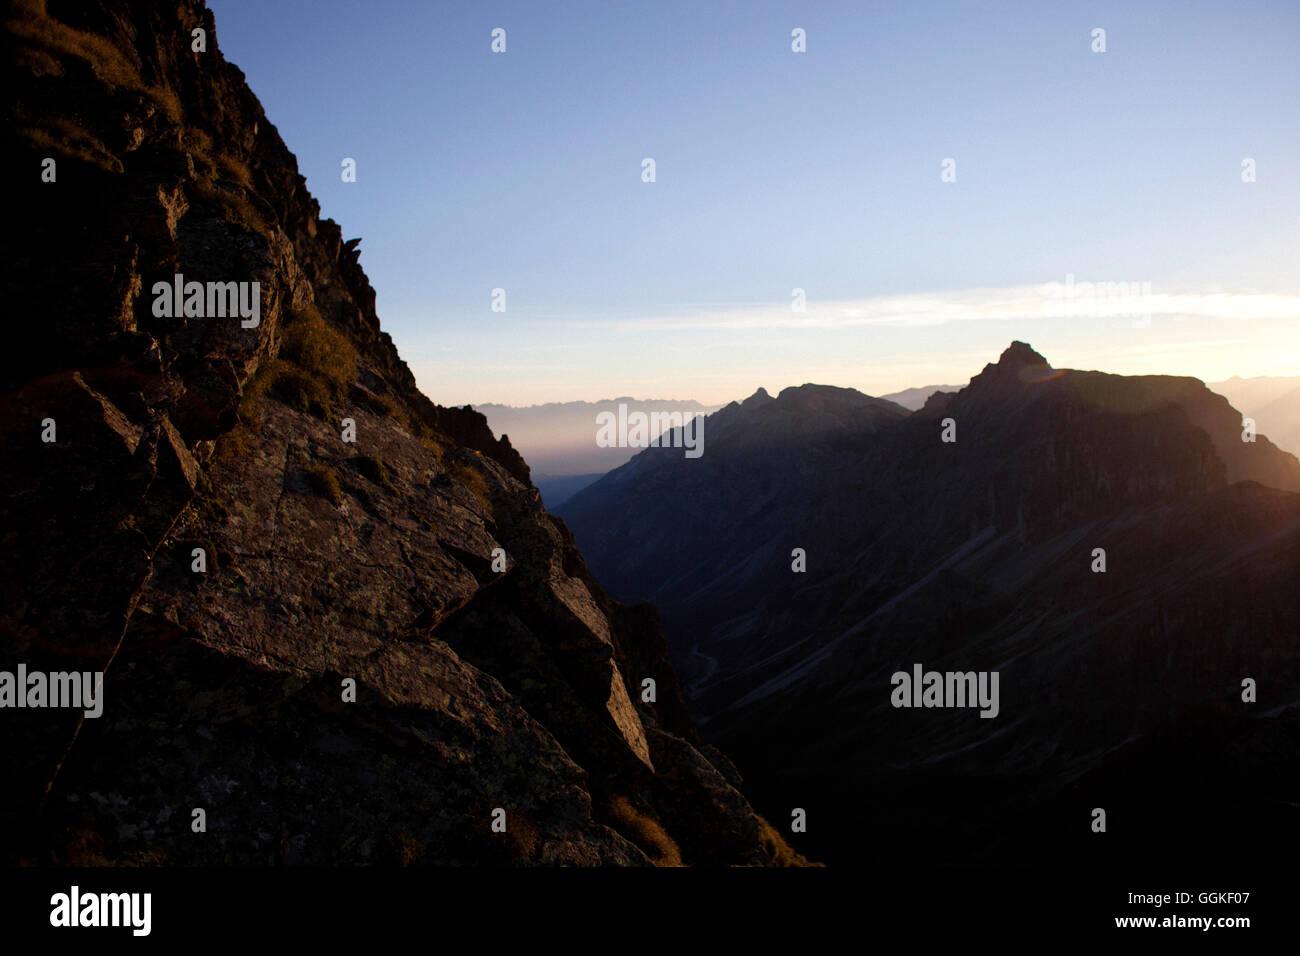 Sunrise, ascend to Habicht (3277 m), Stubai Alps, Tyrol, Austria - Stock Image